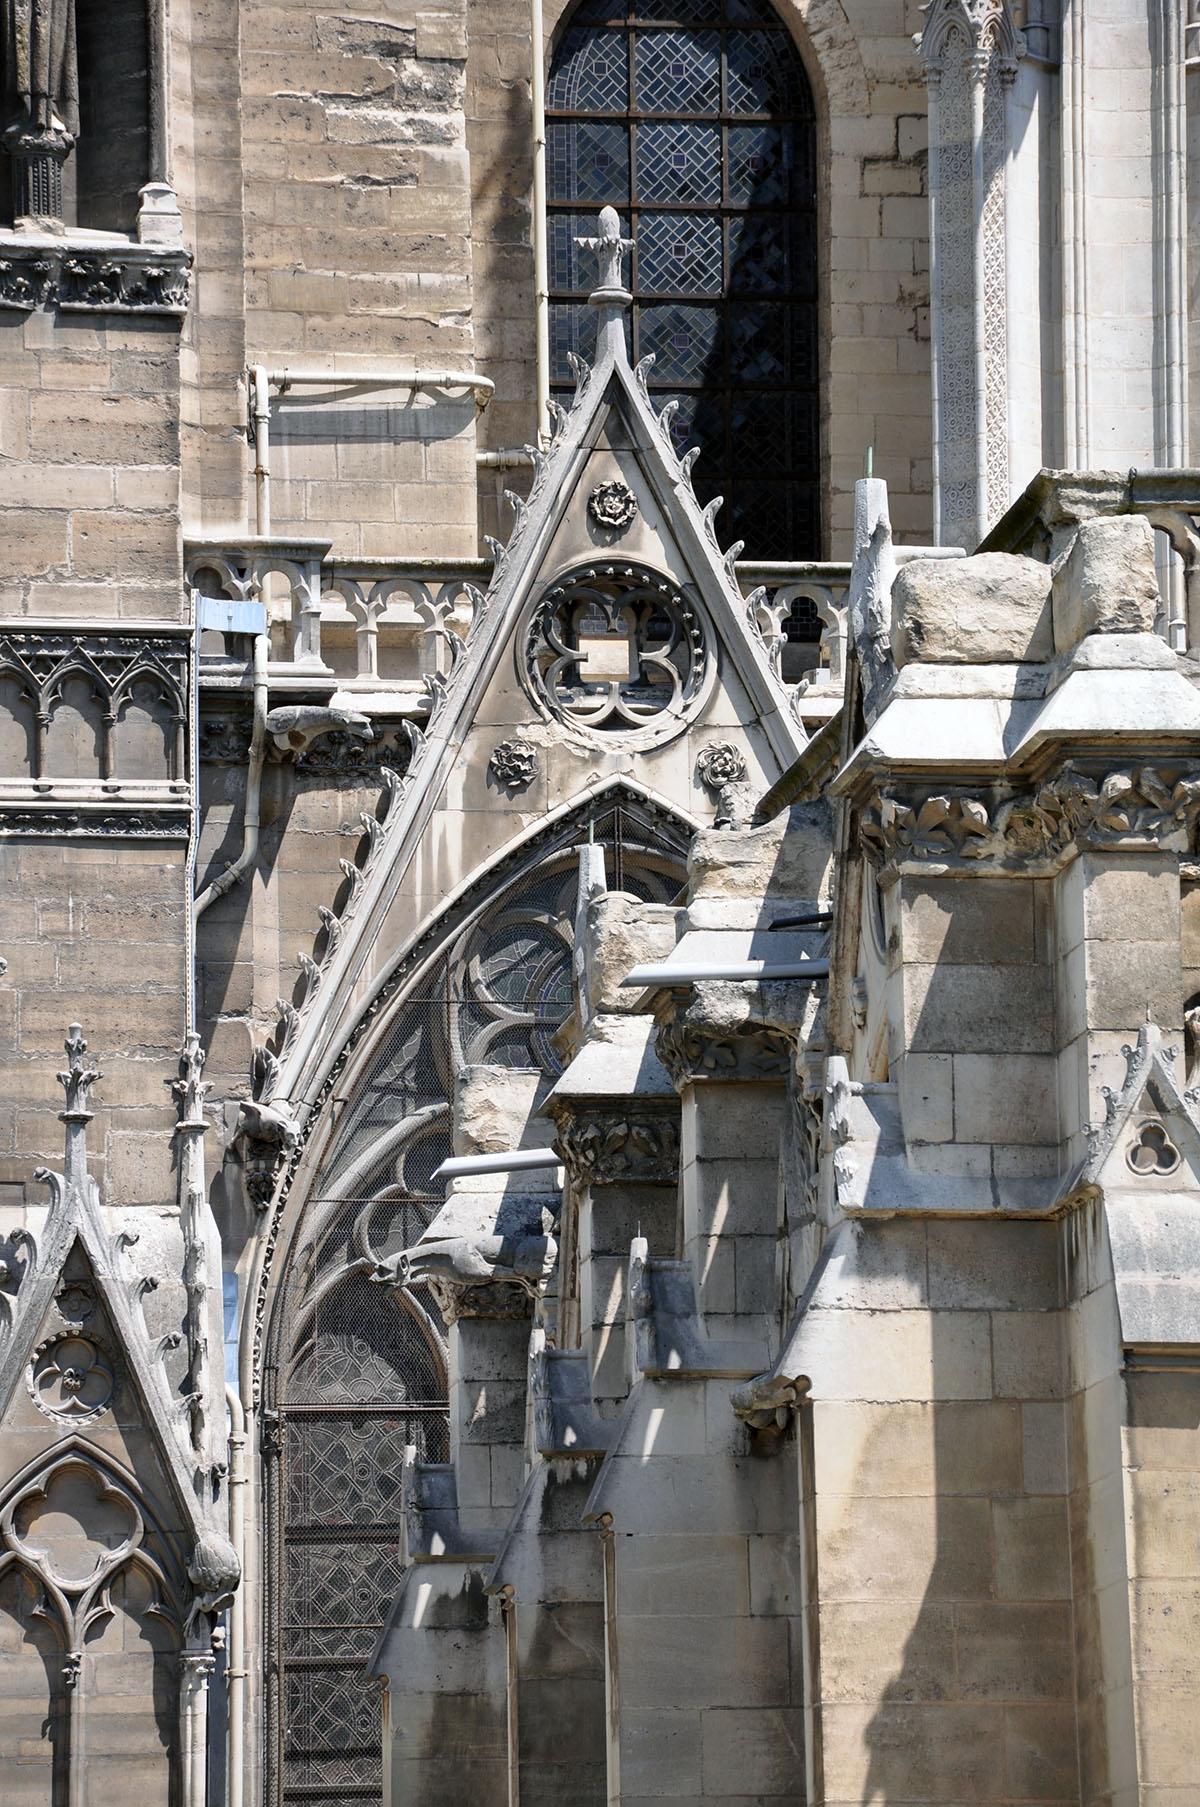 Notre Dame Cathedral exterior 09 June 2010 photo by Bob Borson